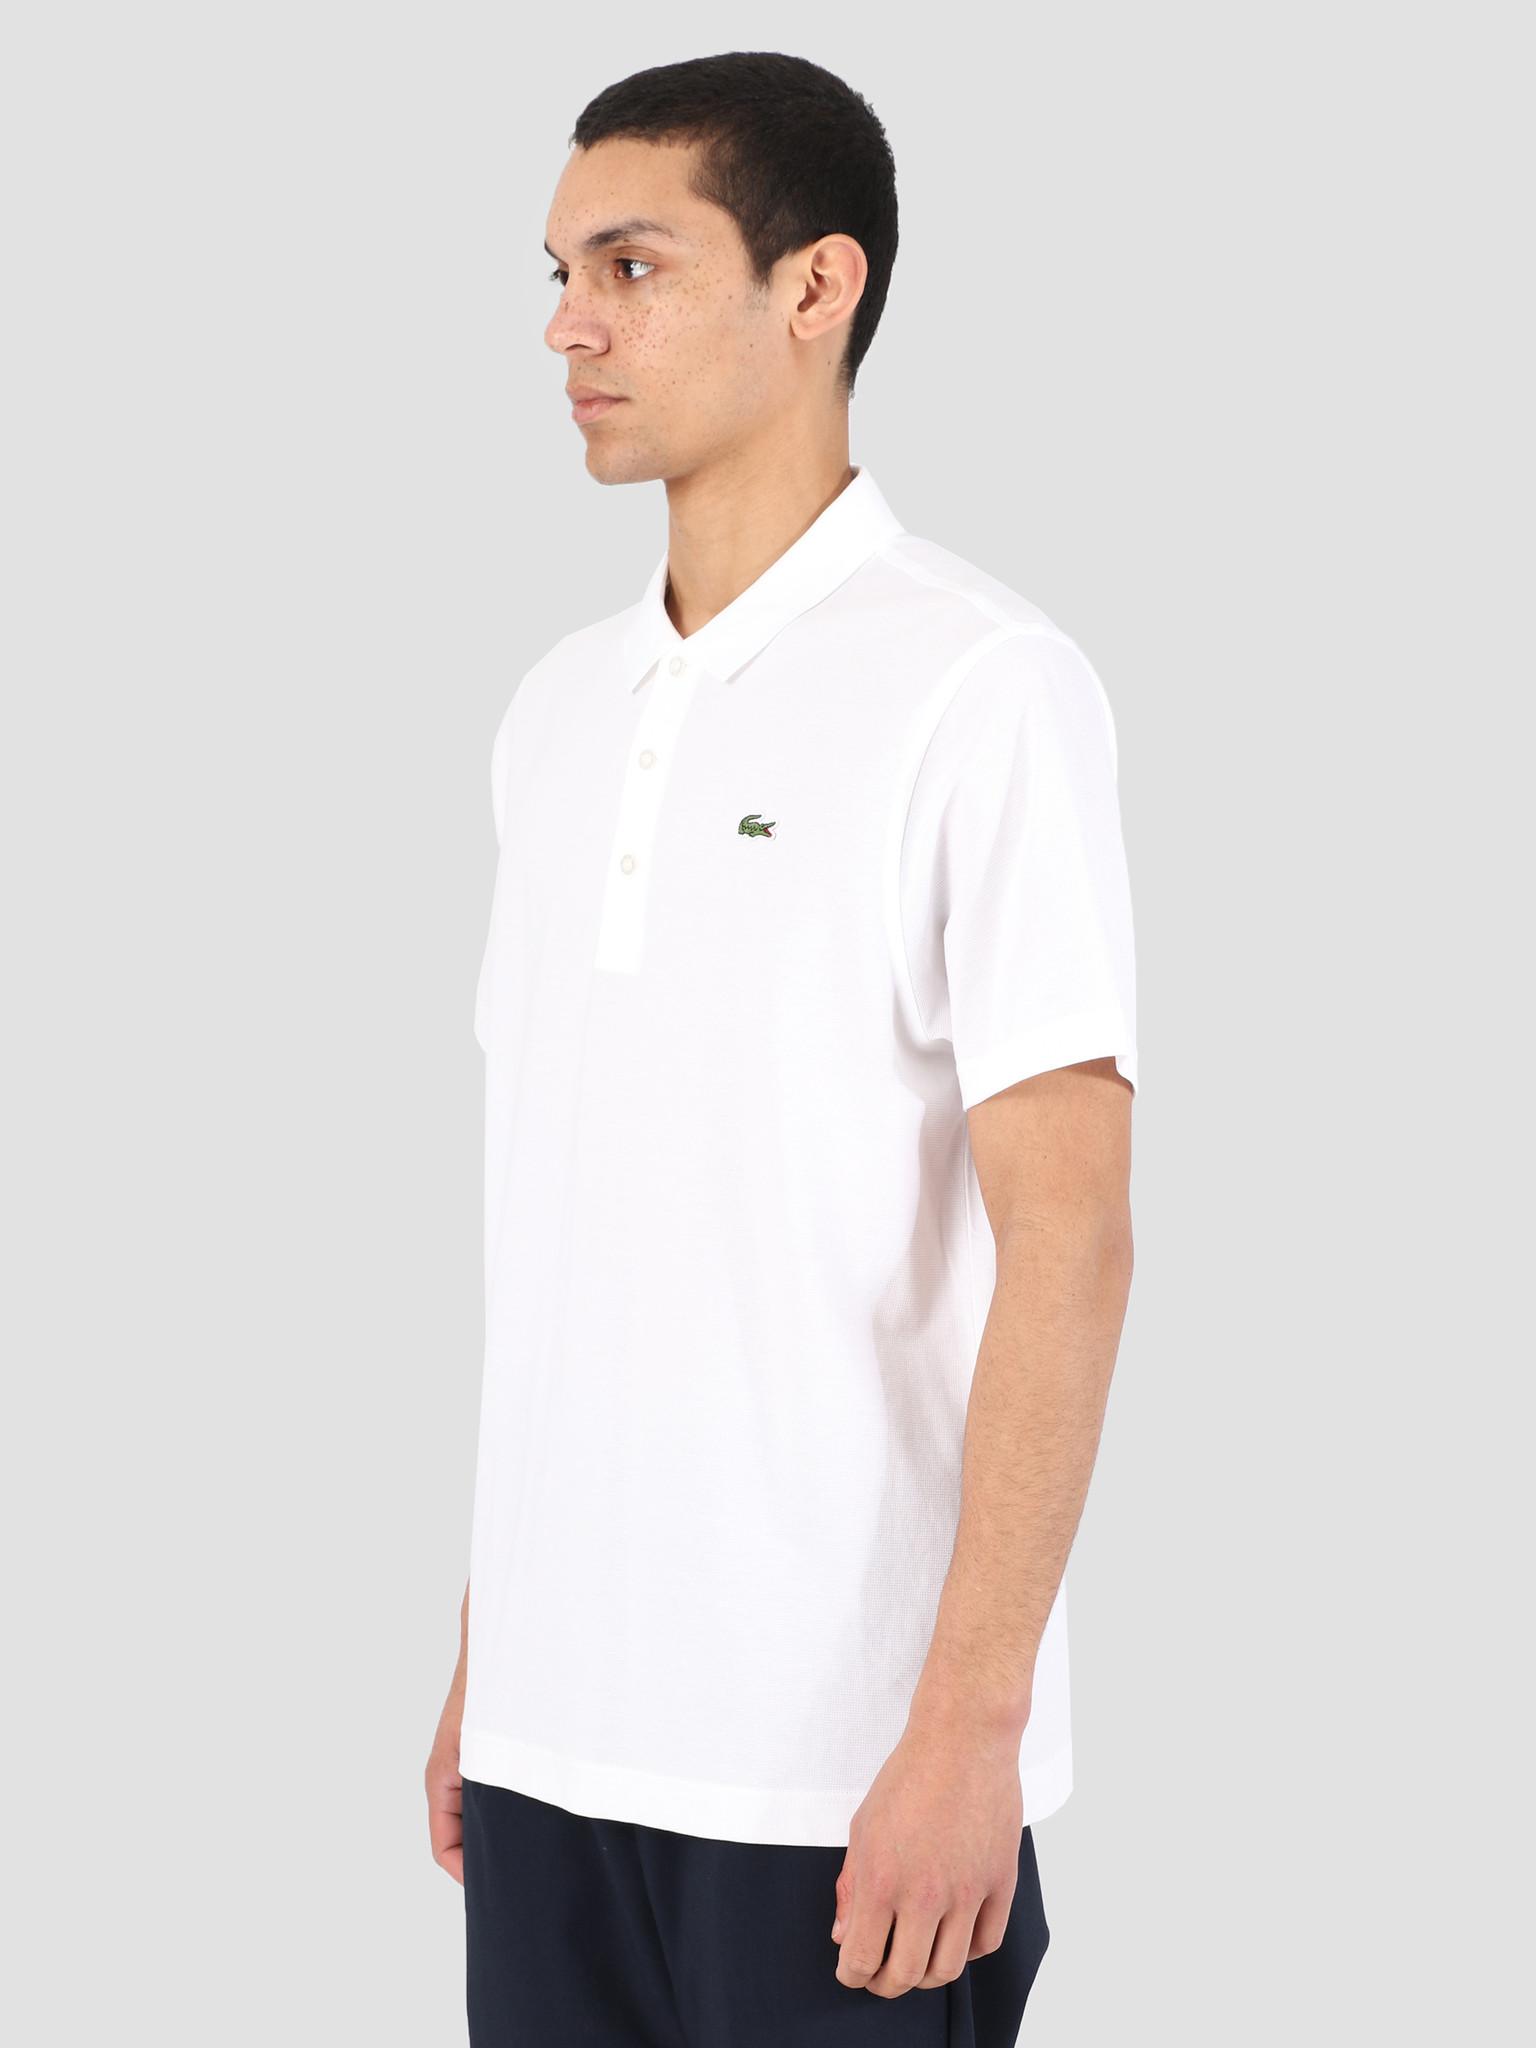 Lacoste Lacoste 1HP3 Polo 06A Blanc L1230-83